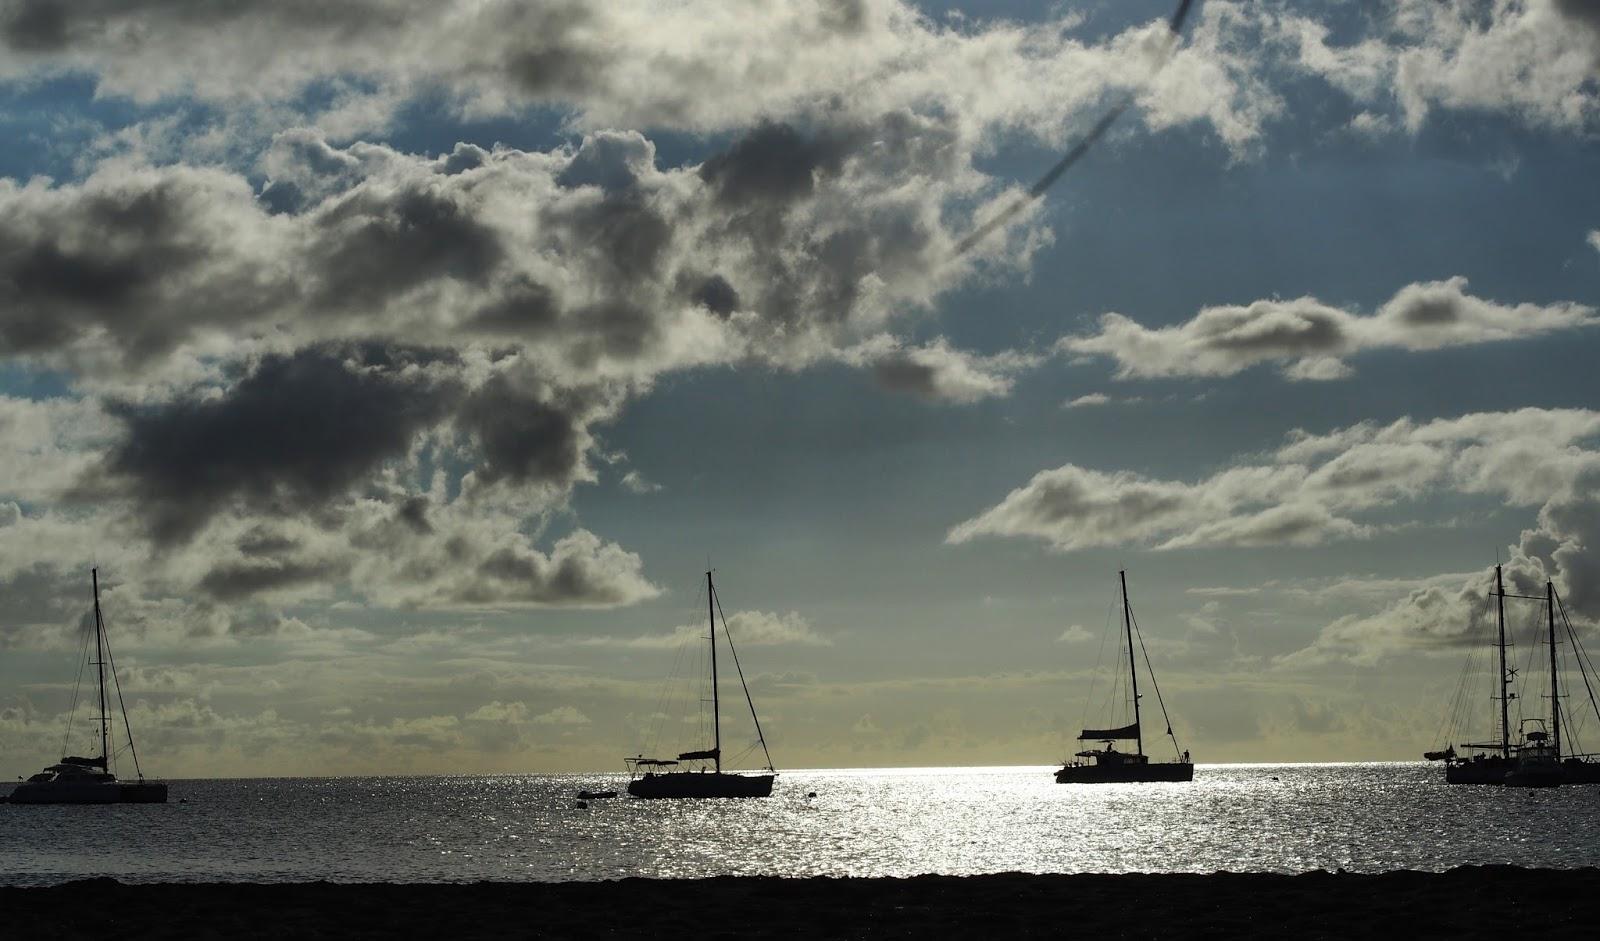 Pinney's Beach, Nevis #NevisSailing #InneysBeach #beach #Nevis #boats #sailin ©2015 Nancy Lundebjergg